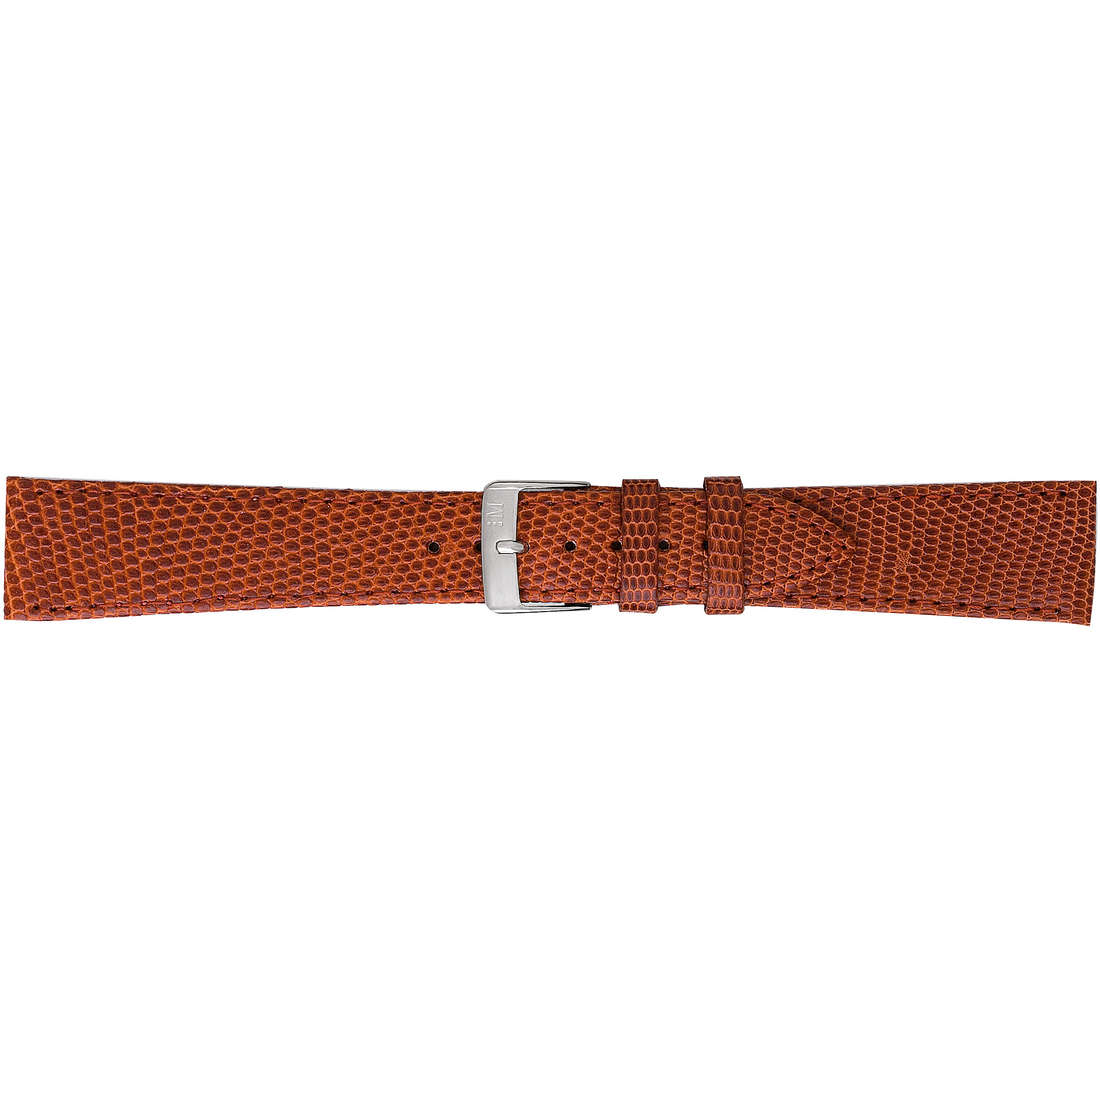 watch watch bands watch straps man Morellato Pelli Preziose A01U0858040041CR20